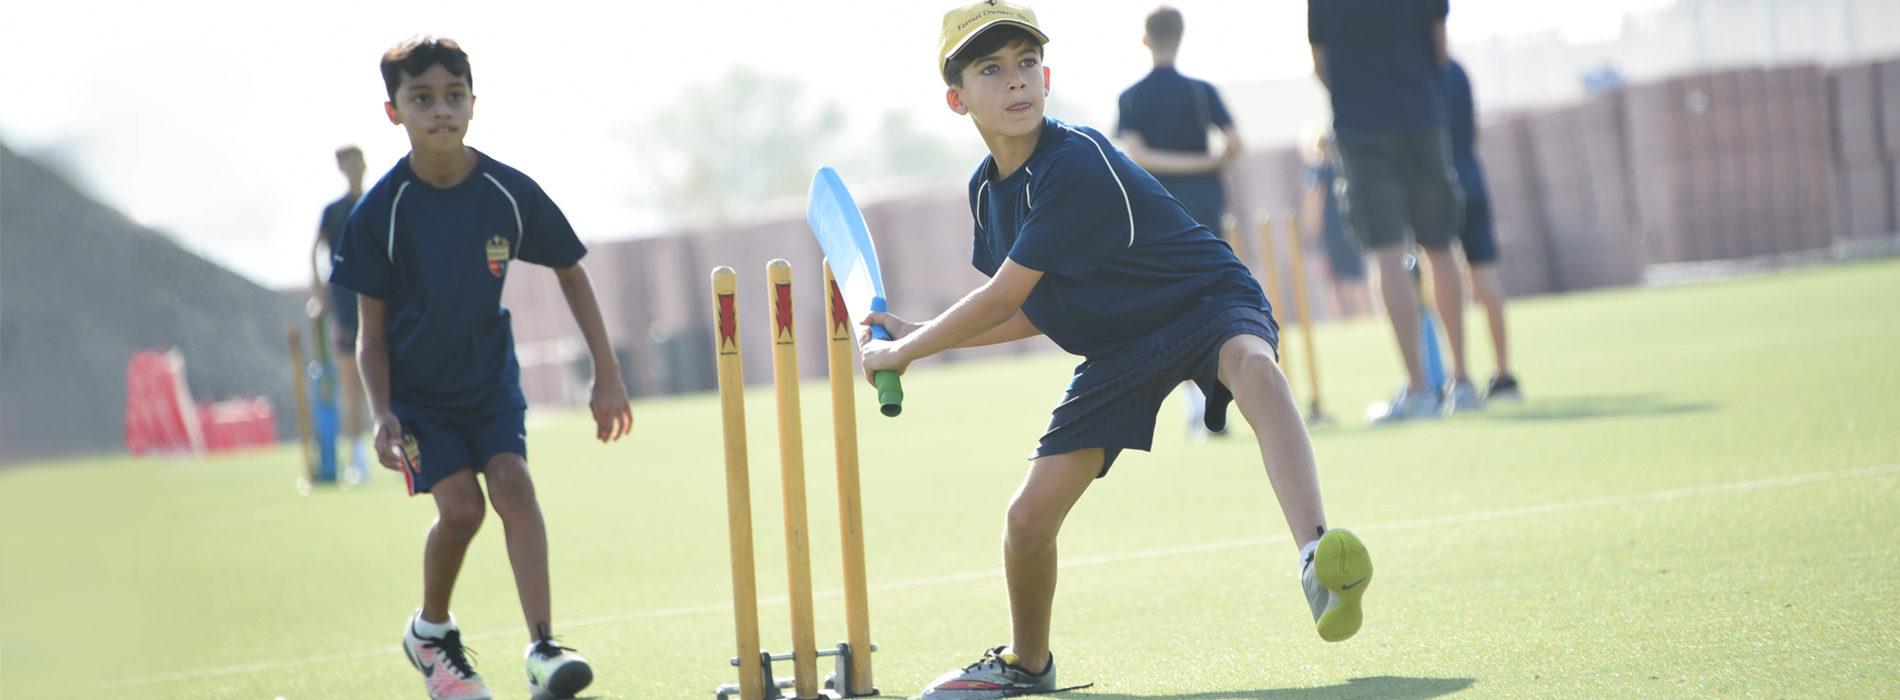 International cricket star partners with Kings' schools in Dubai